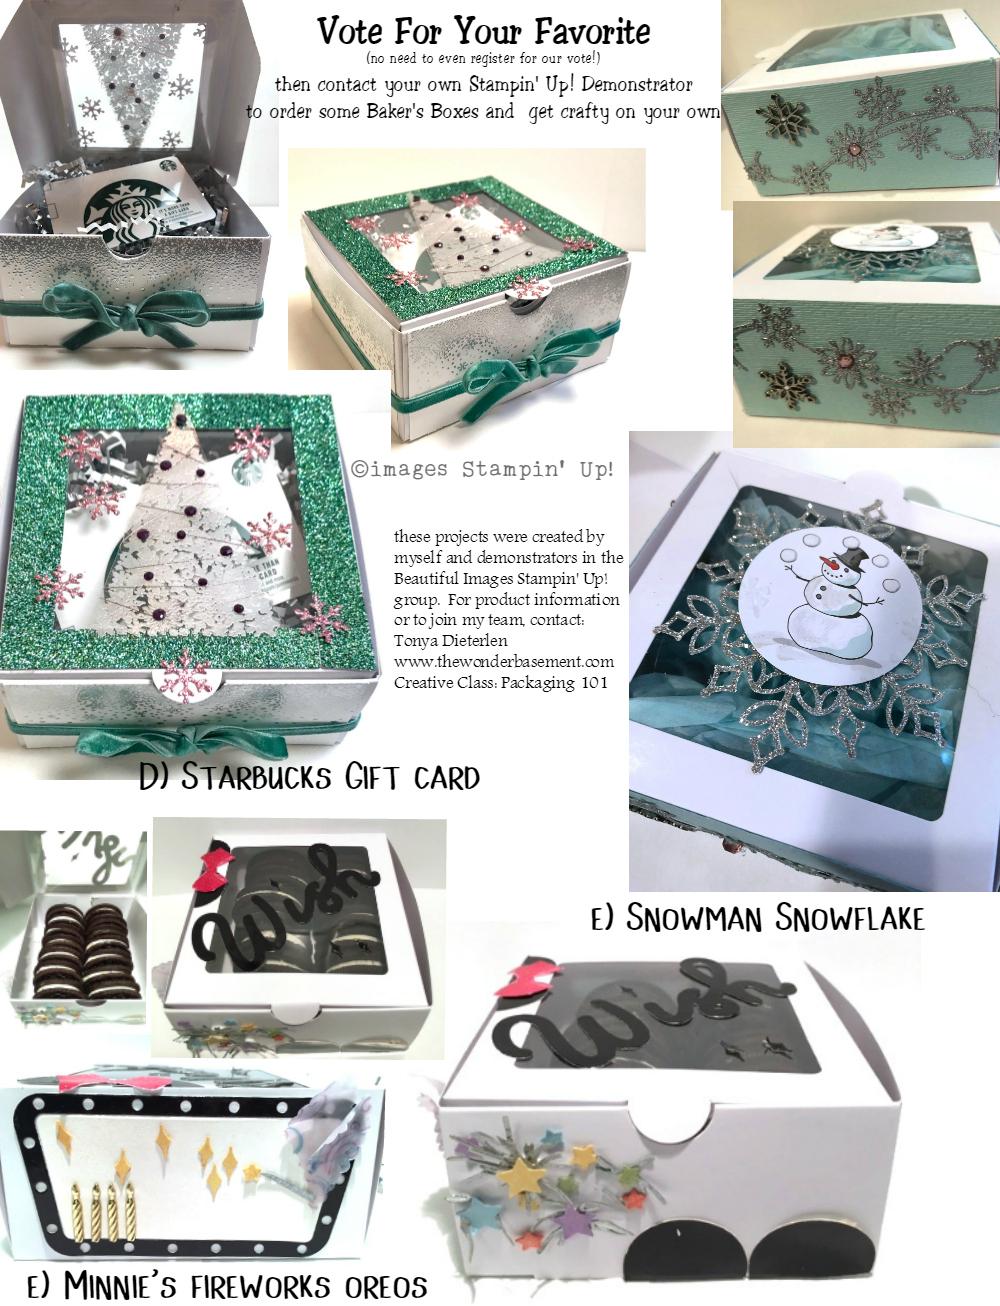 D. Starbucks Gift Card  E. Snowman Snowflake  F.Minnie's Firework Oreos